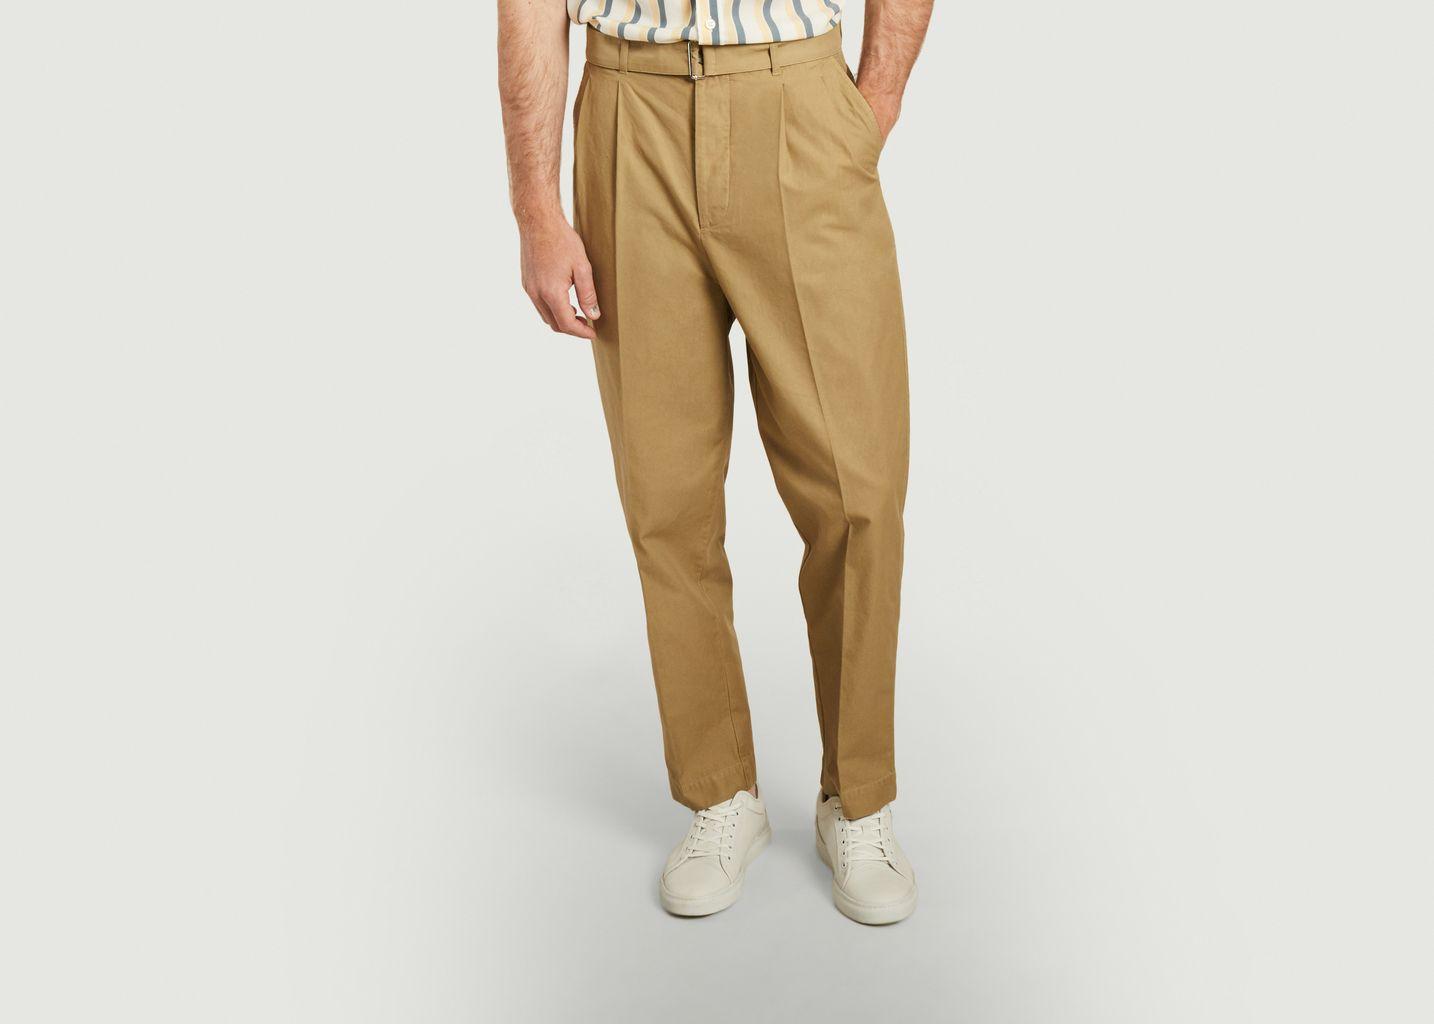 Pantalon Chino Luigi  - Officine Générale